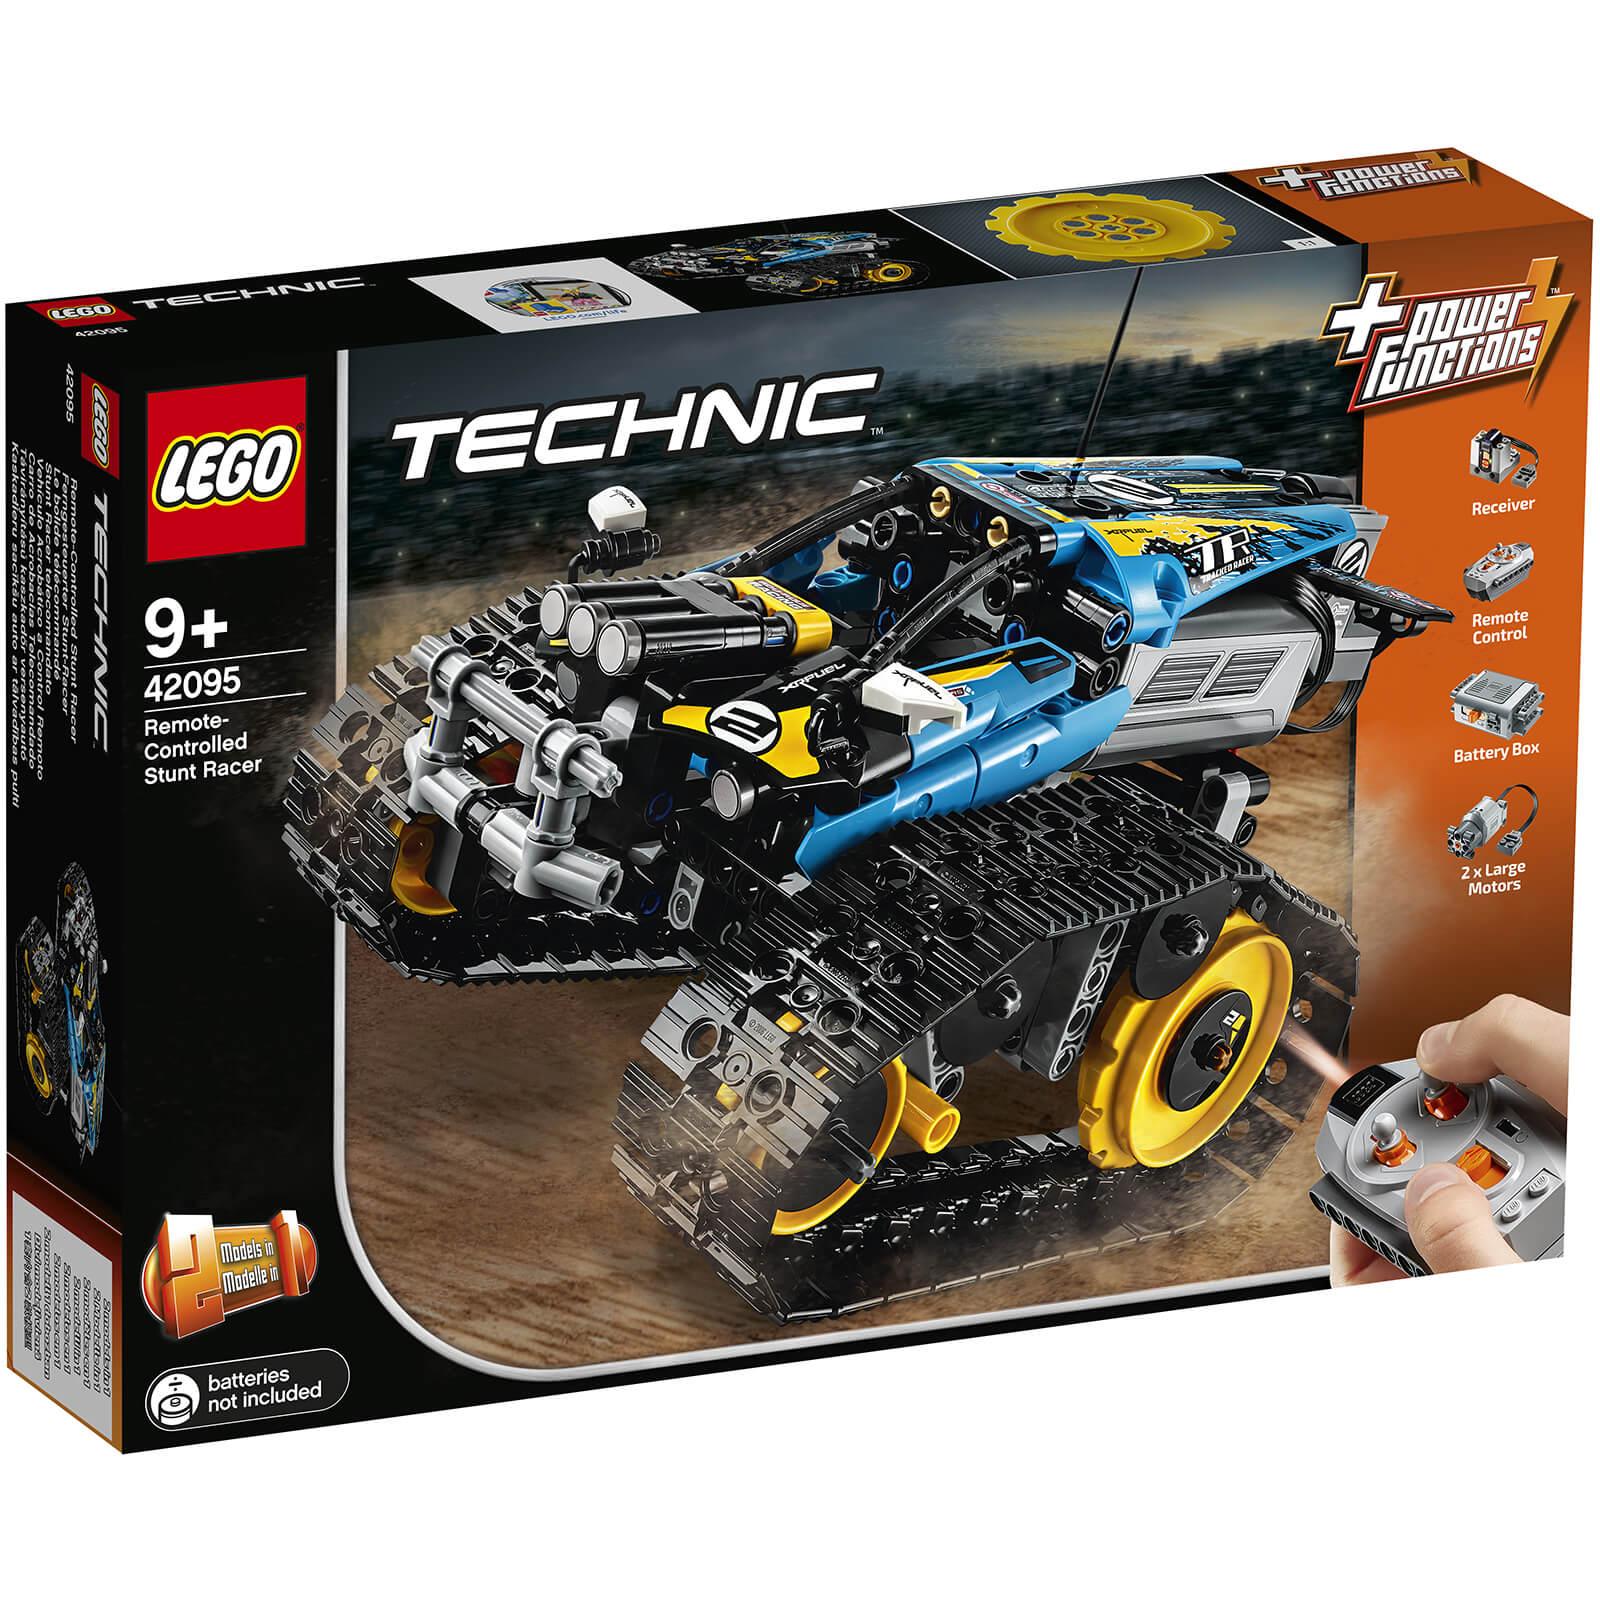 Lego Technic Remote Controlled Stunt Racer 42095 Toys Thehutcom